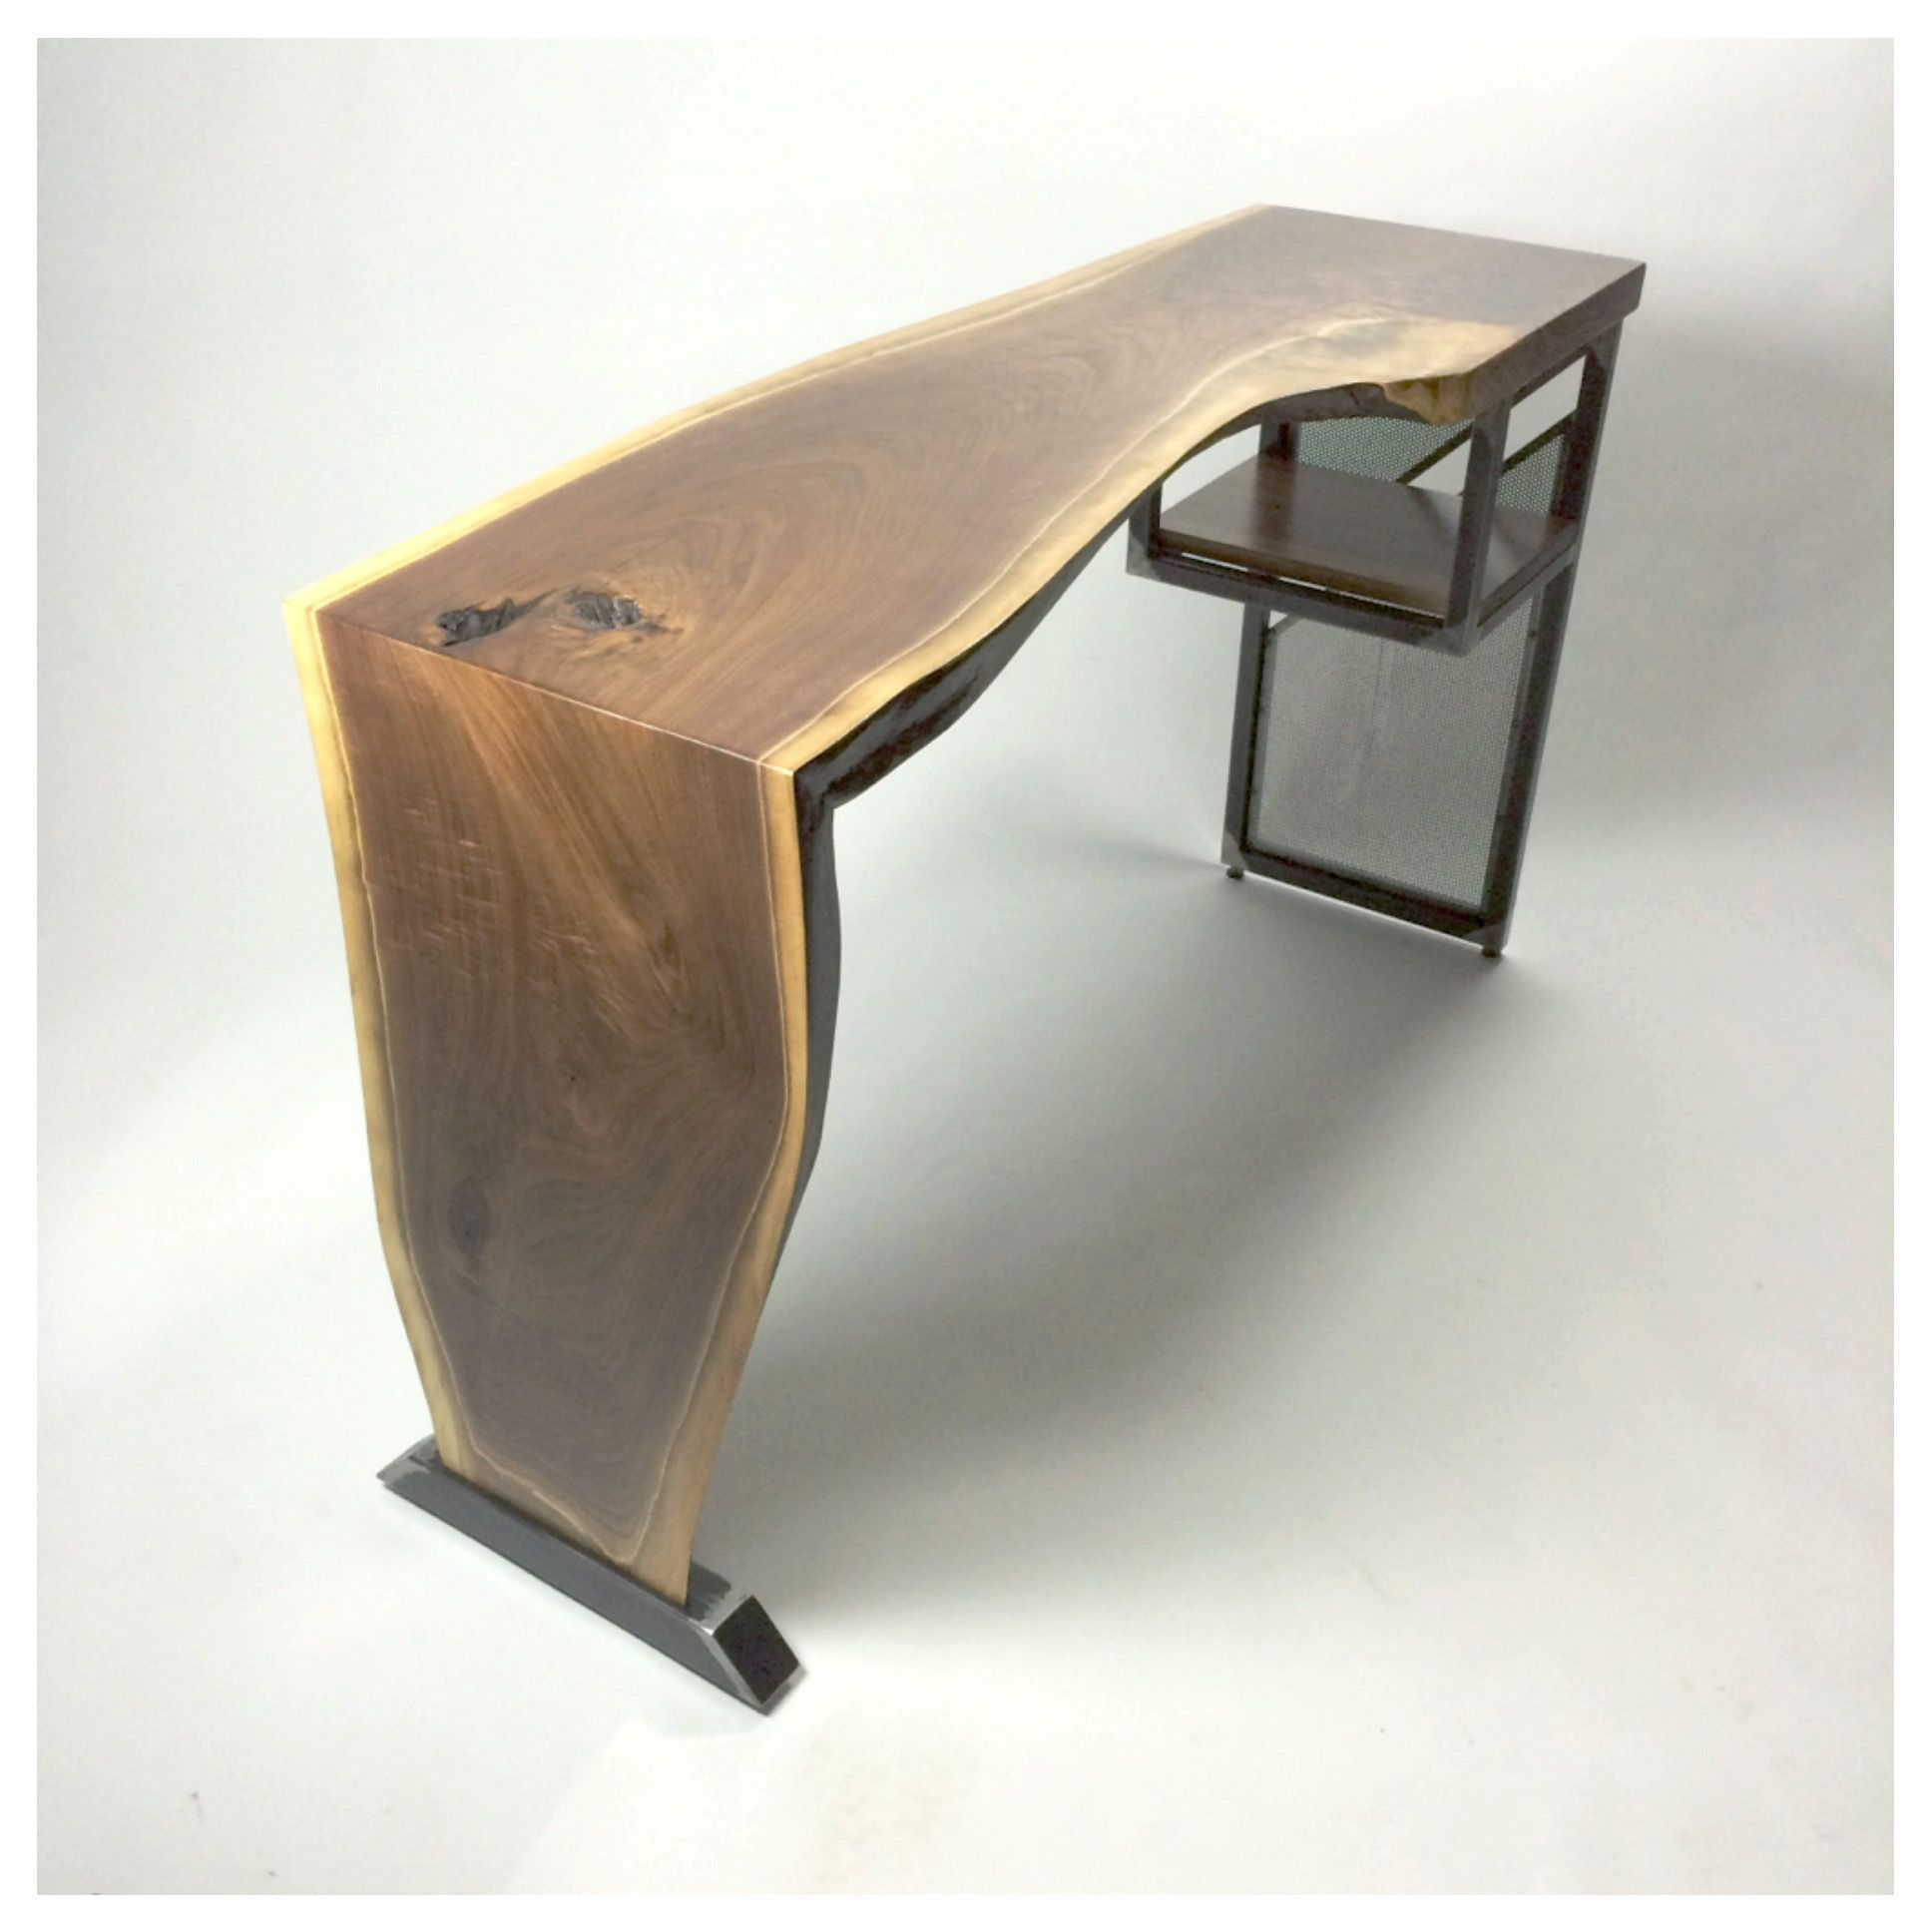 Awesome Custom Made Live Edge Waterfall Desk Modern Industrial Steel Wood